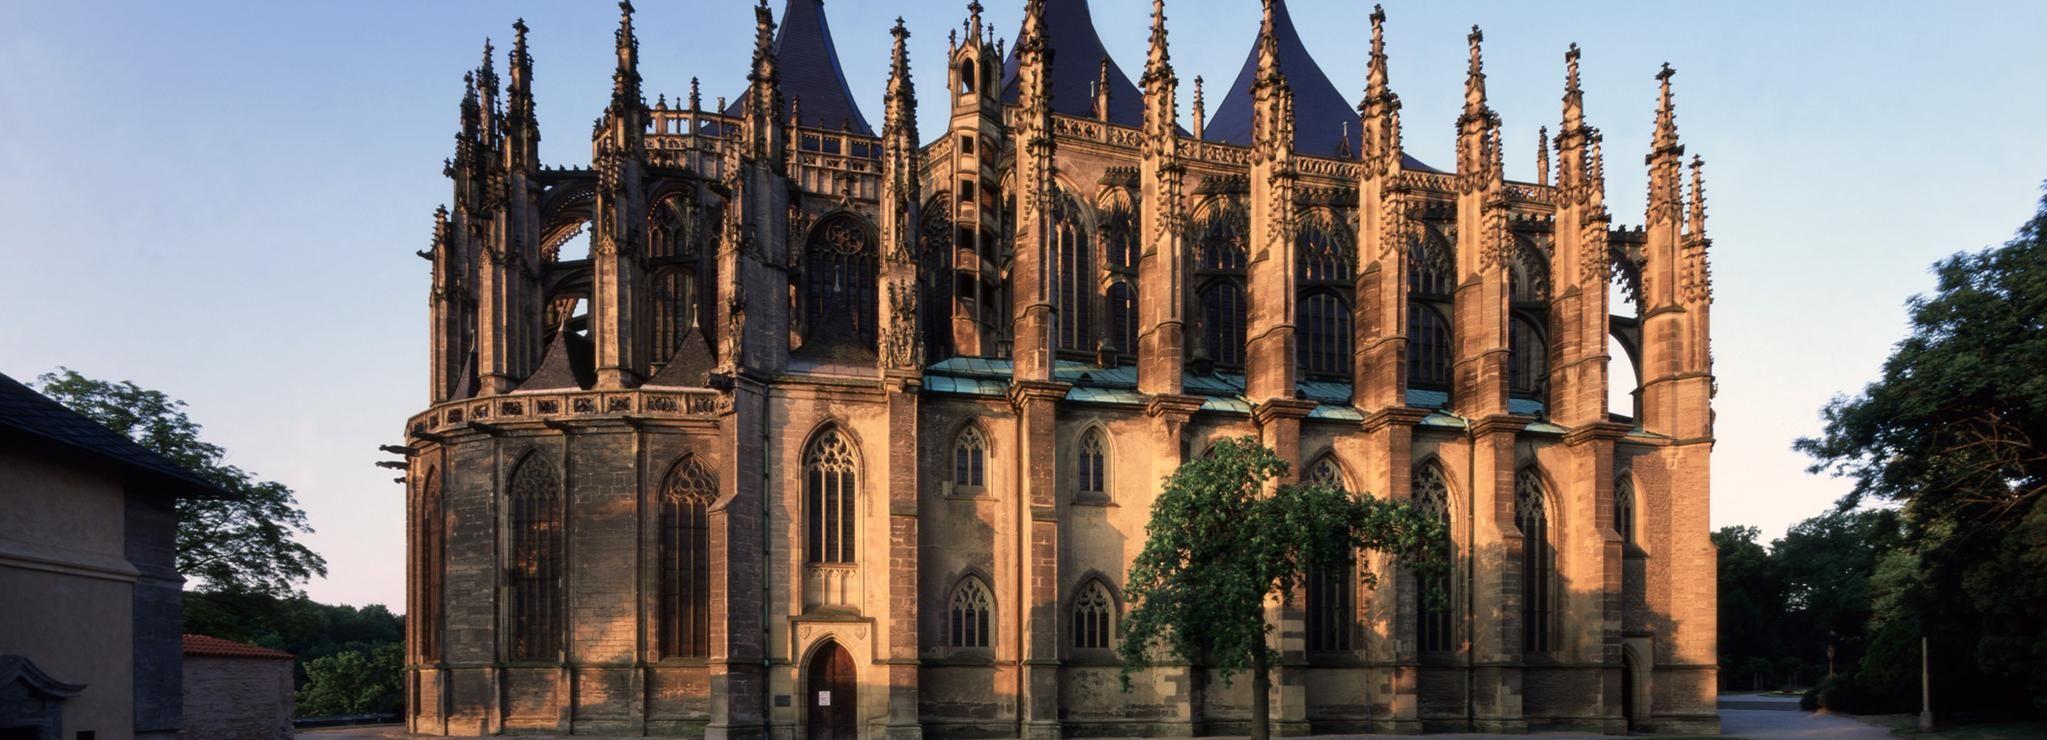 Desde Praga: tour a pie Kutna Hora y Catedral Santa Bárbara